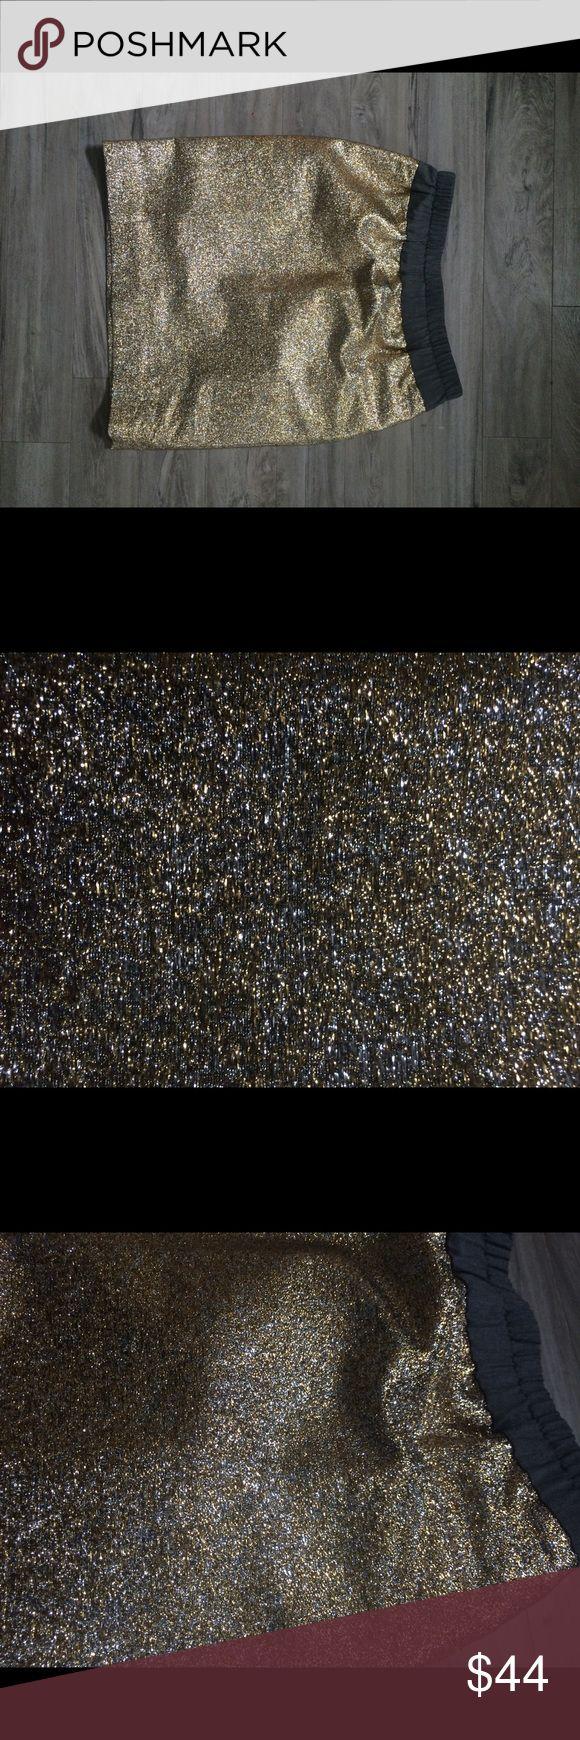 J. CREW 100% Linen lined metallic skirt NEOT Sz 2 J. CREW 100% Linen lined metallic skirt NEOT Sz 2. Excellent condition. Never worn. Wool and metallic exterior; Linen interior. See pictures for measurements. B12 J. Crew Skirts